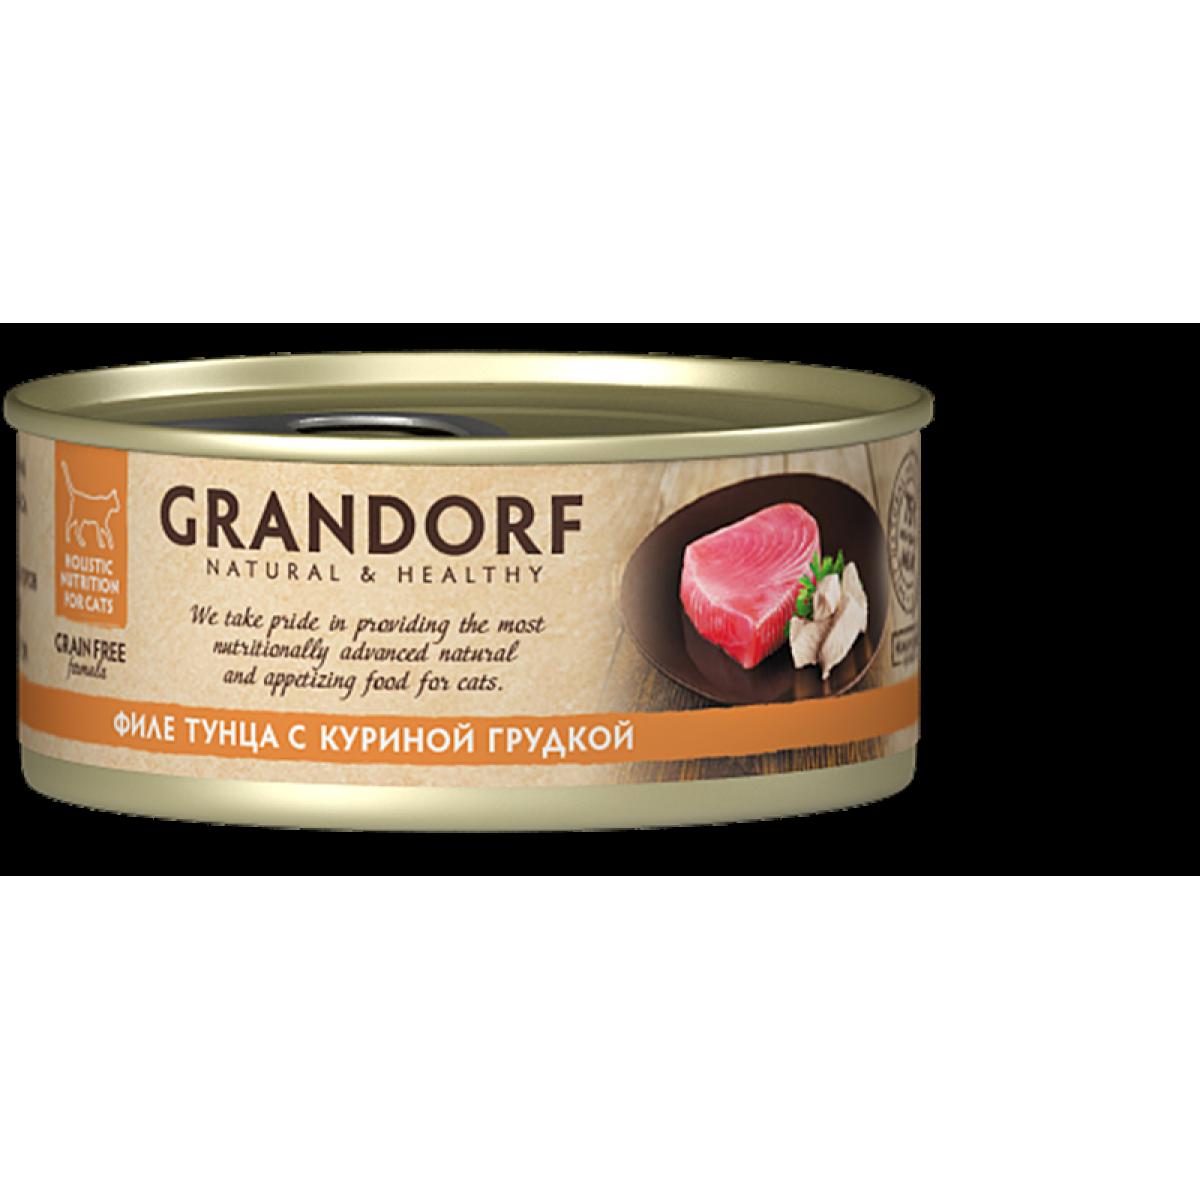 Grandorf Cat конс д/кошек Филе тунца куриная грудка 70 г